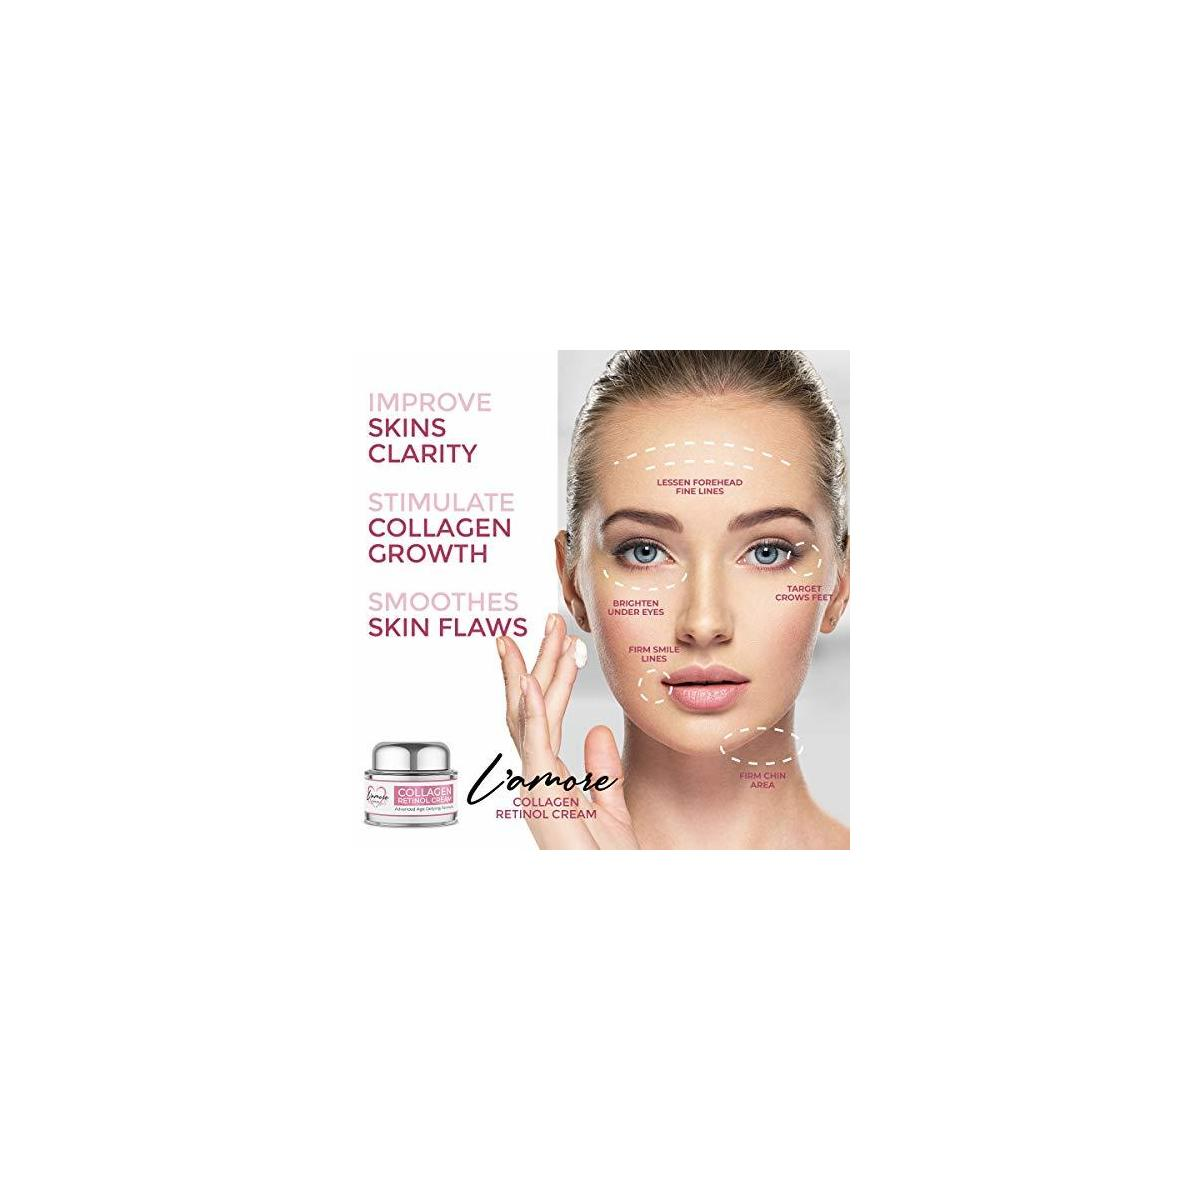 L'amore Beauty Collagen Retinol Cream